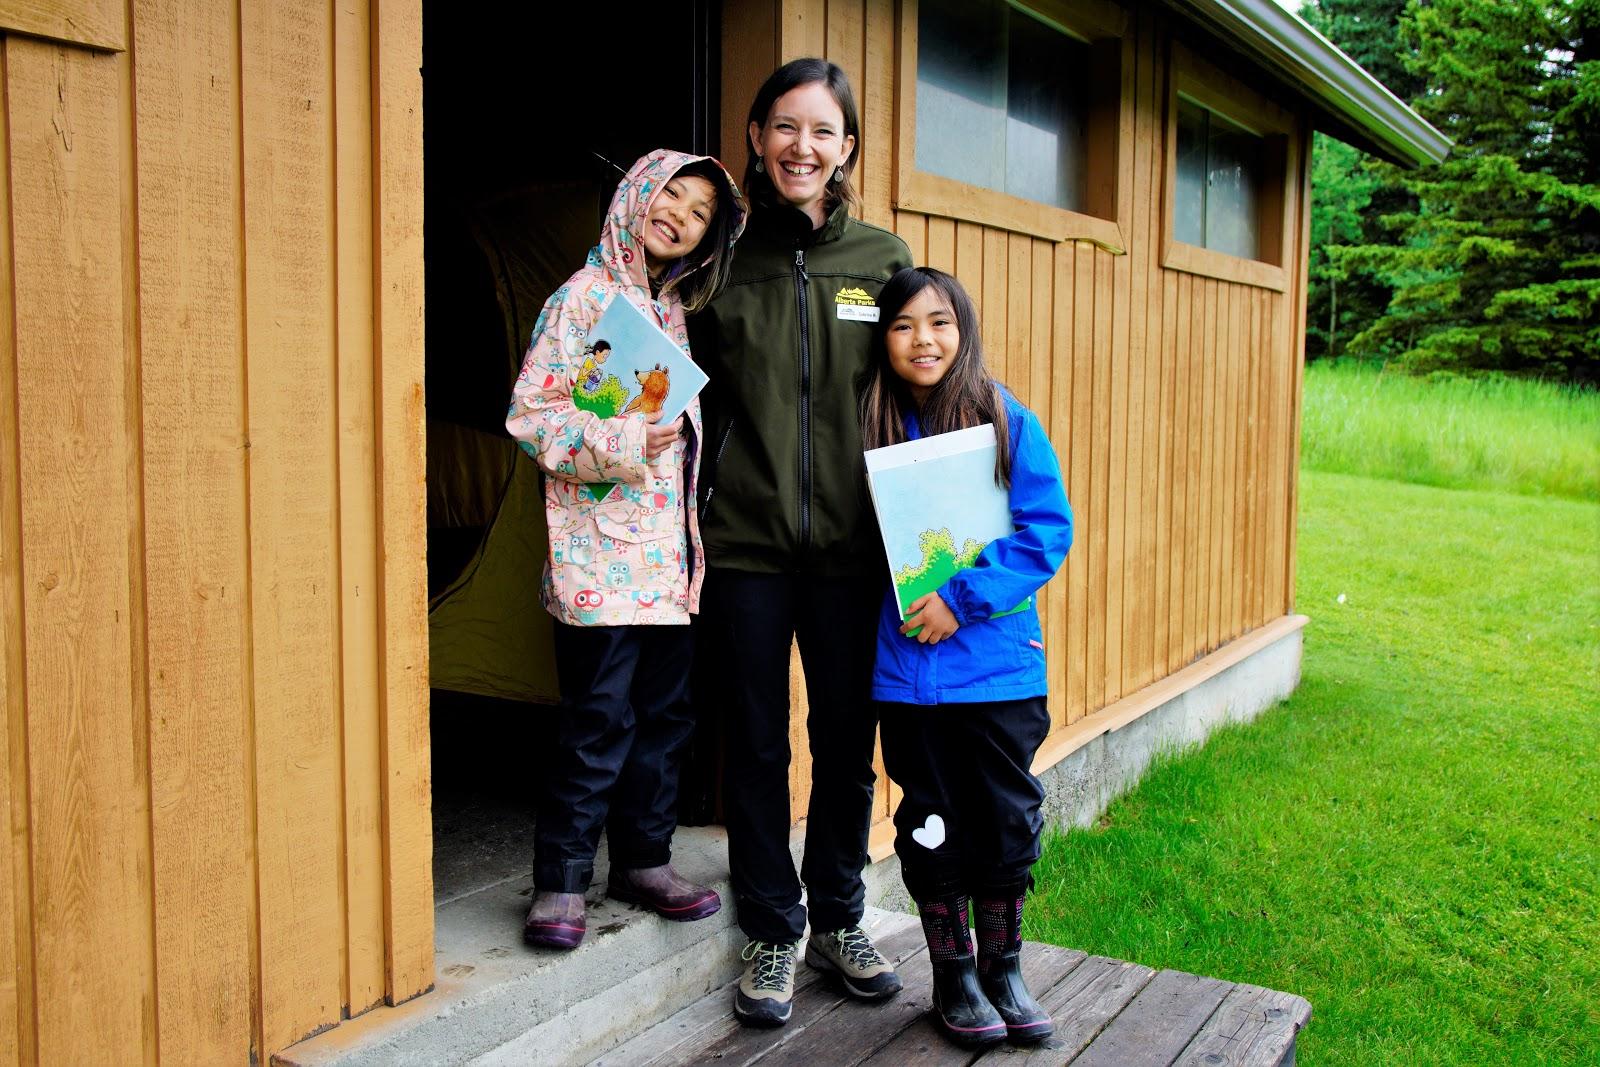 Beauvais Lake Provincial Park interpretive program